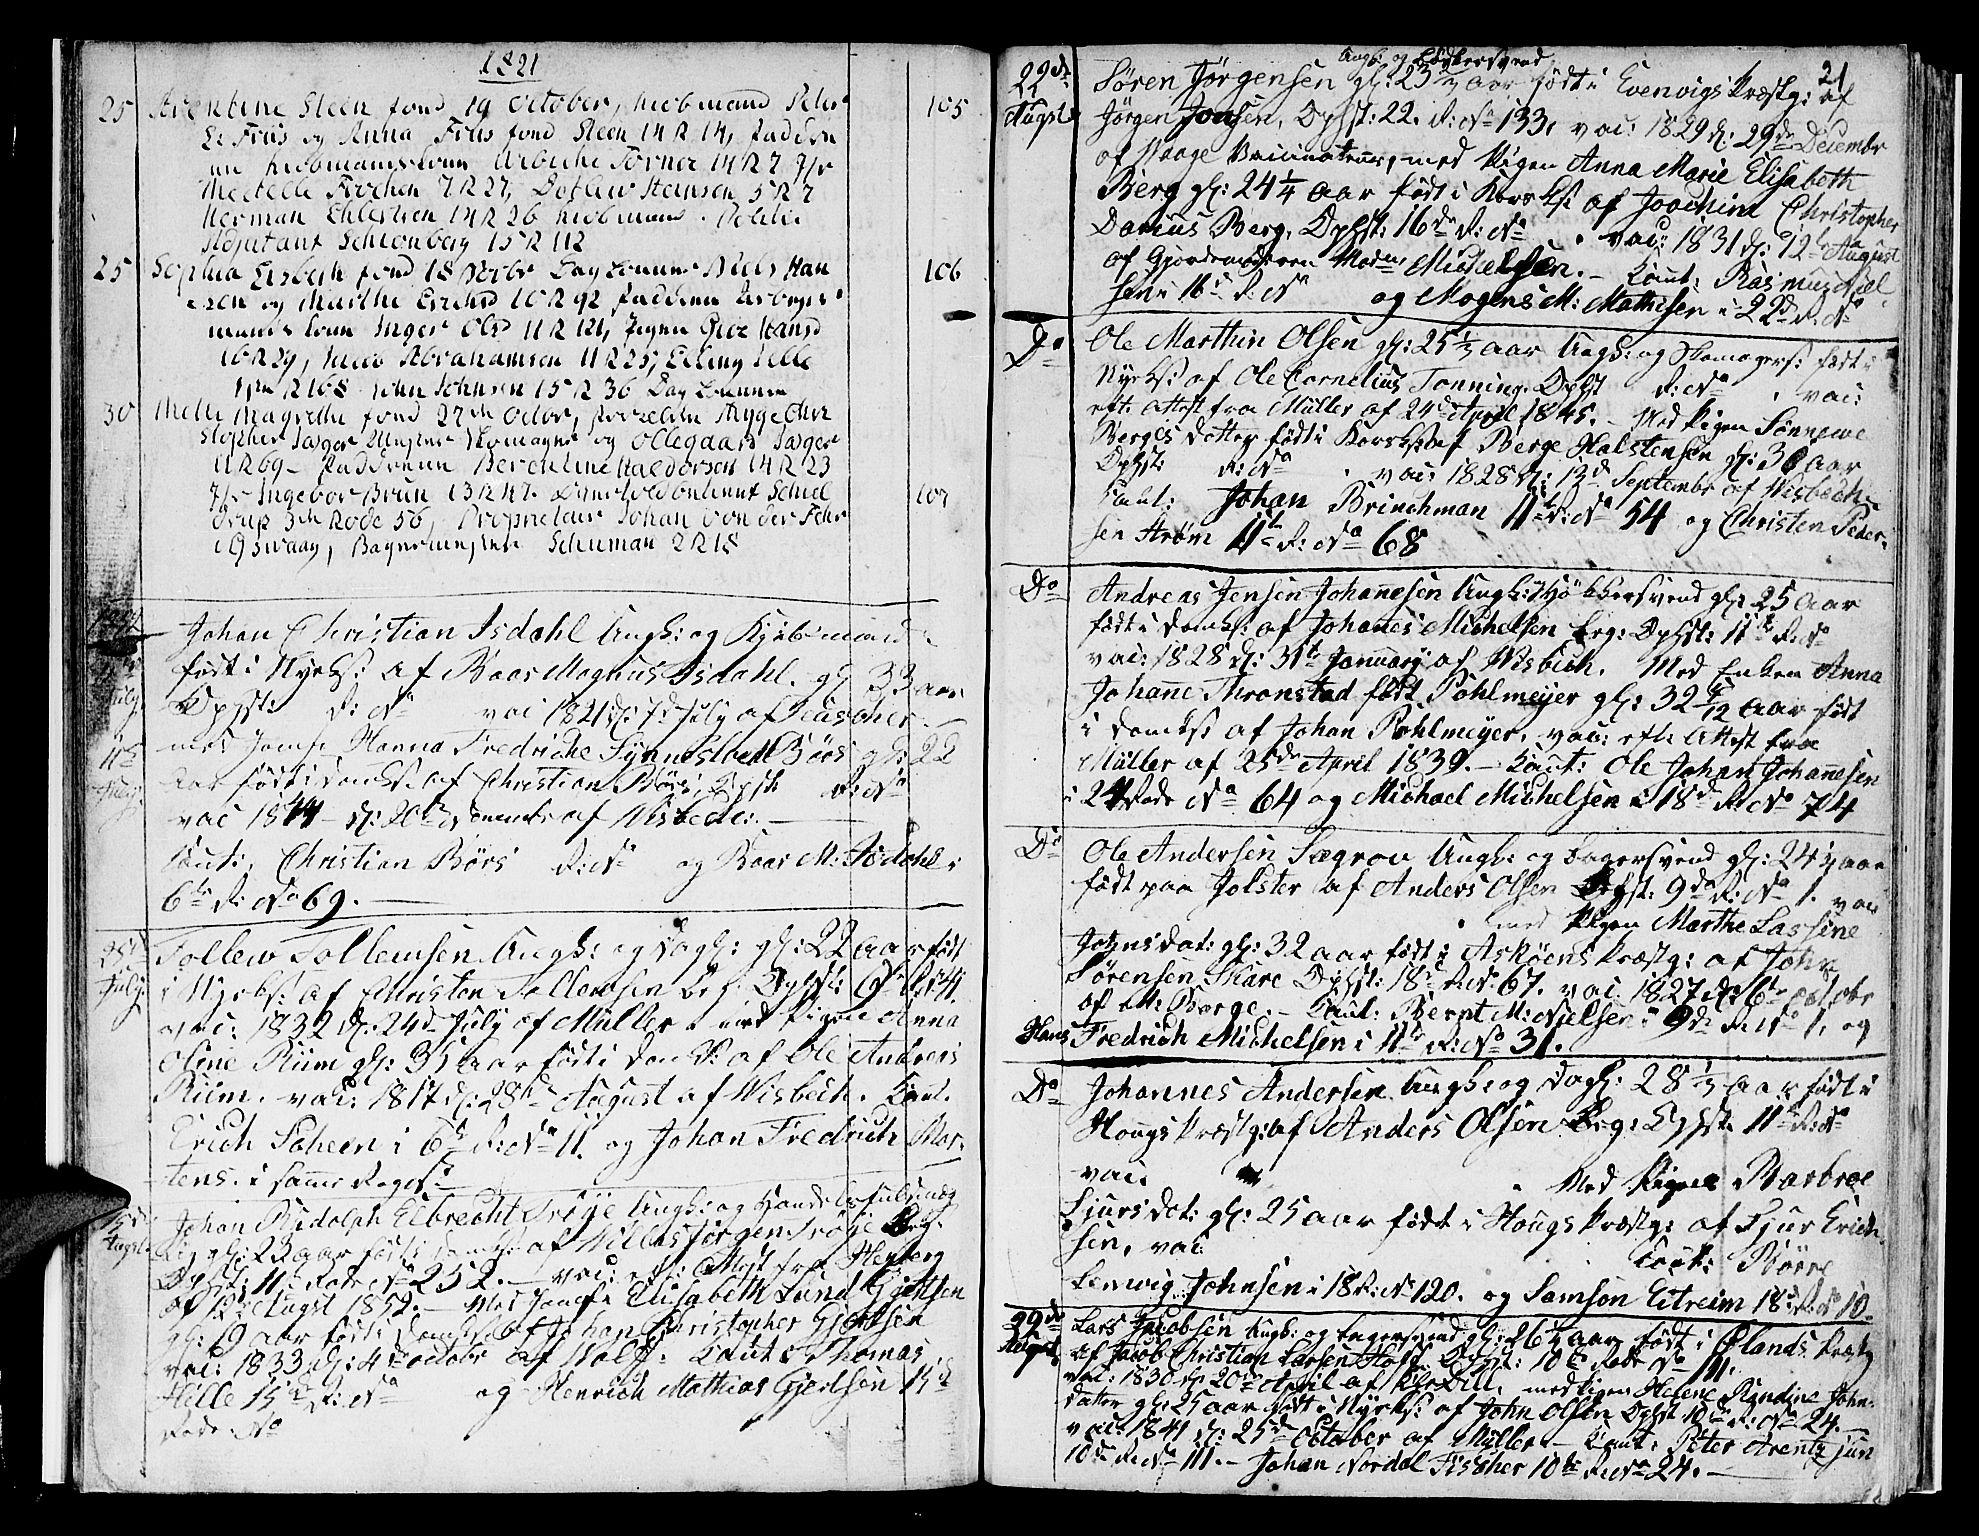 SAB, Domkirken sokneprestembete, H/Hab/L0003: Klokkerbok nr. A 3, 1820-1853, s. 21